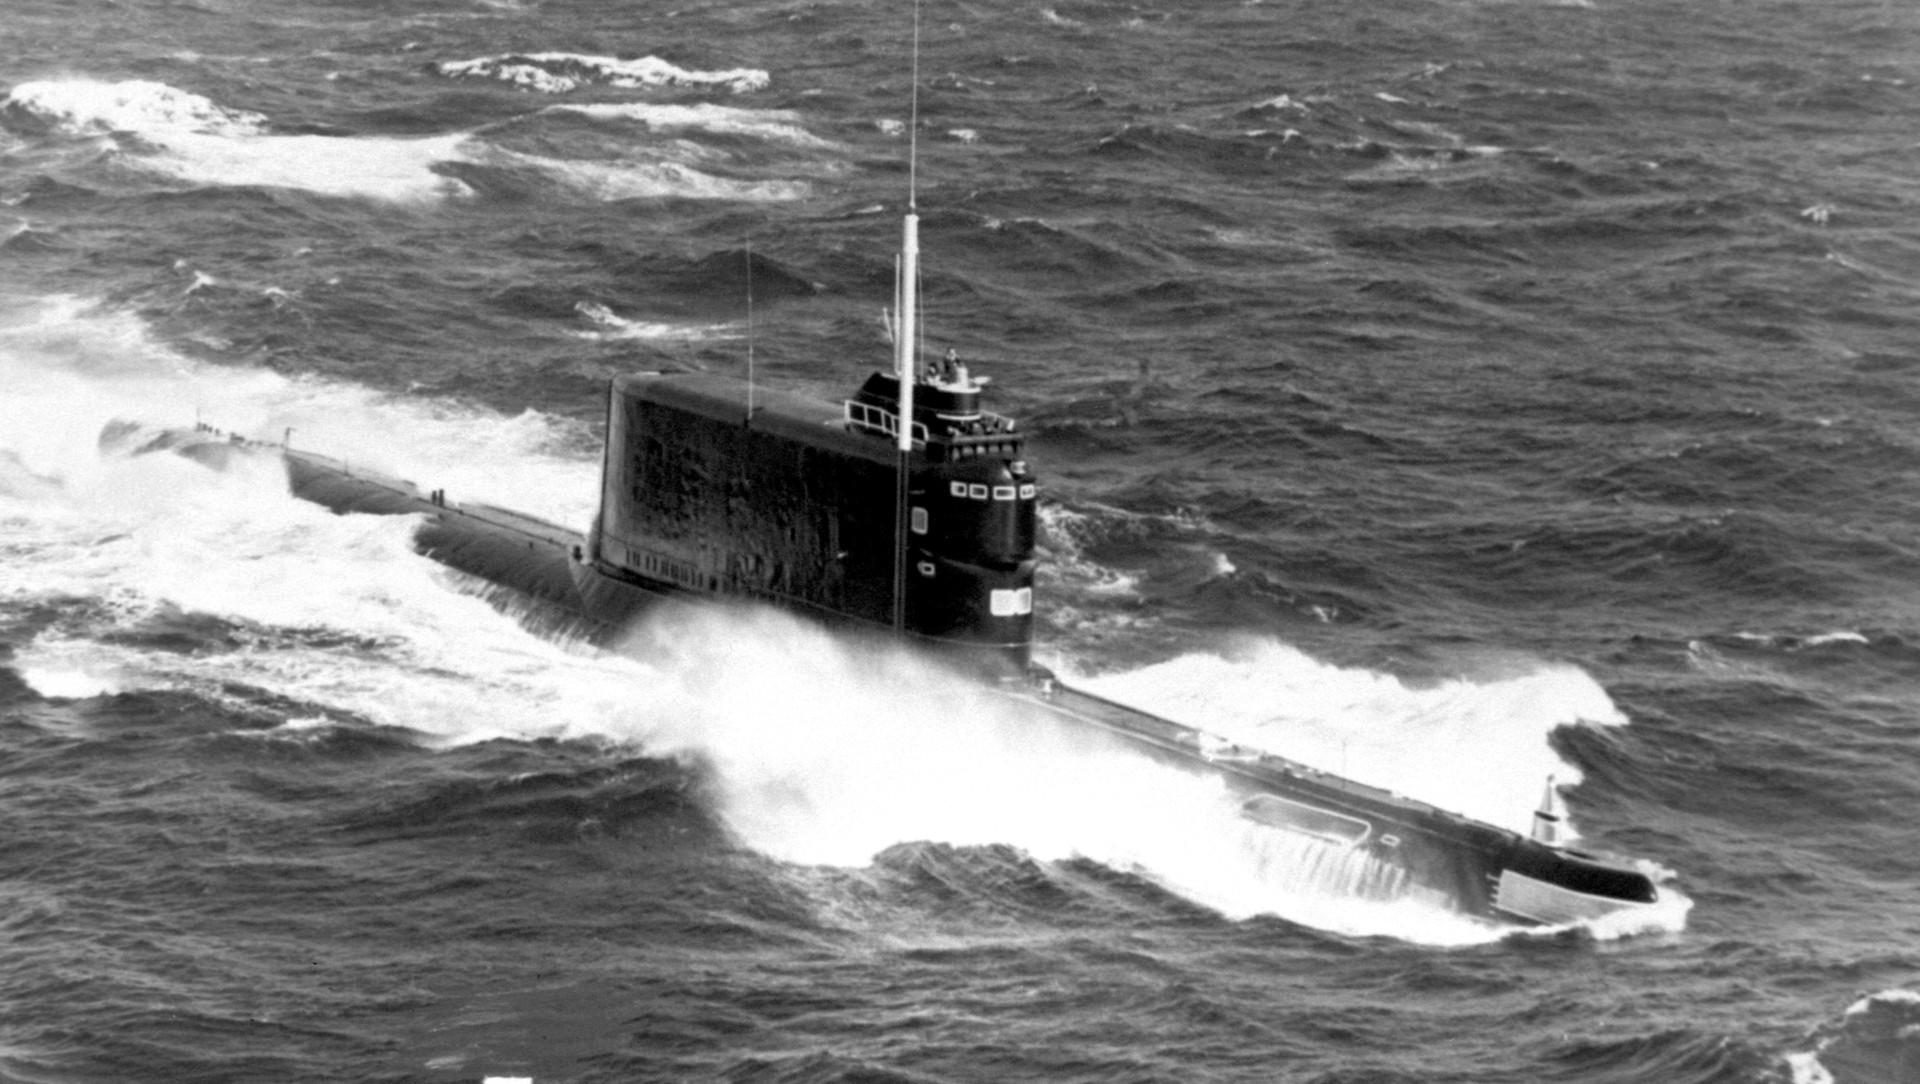 Submarino soviético da classe Golf II, 1985